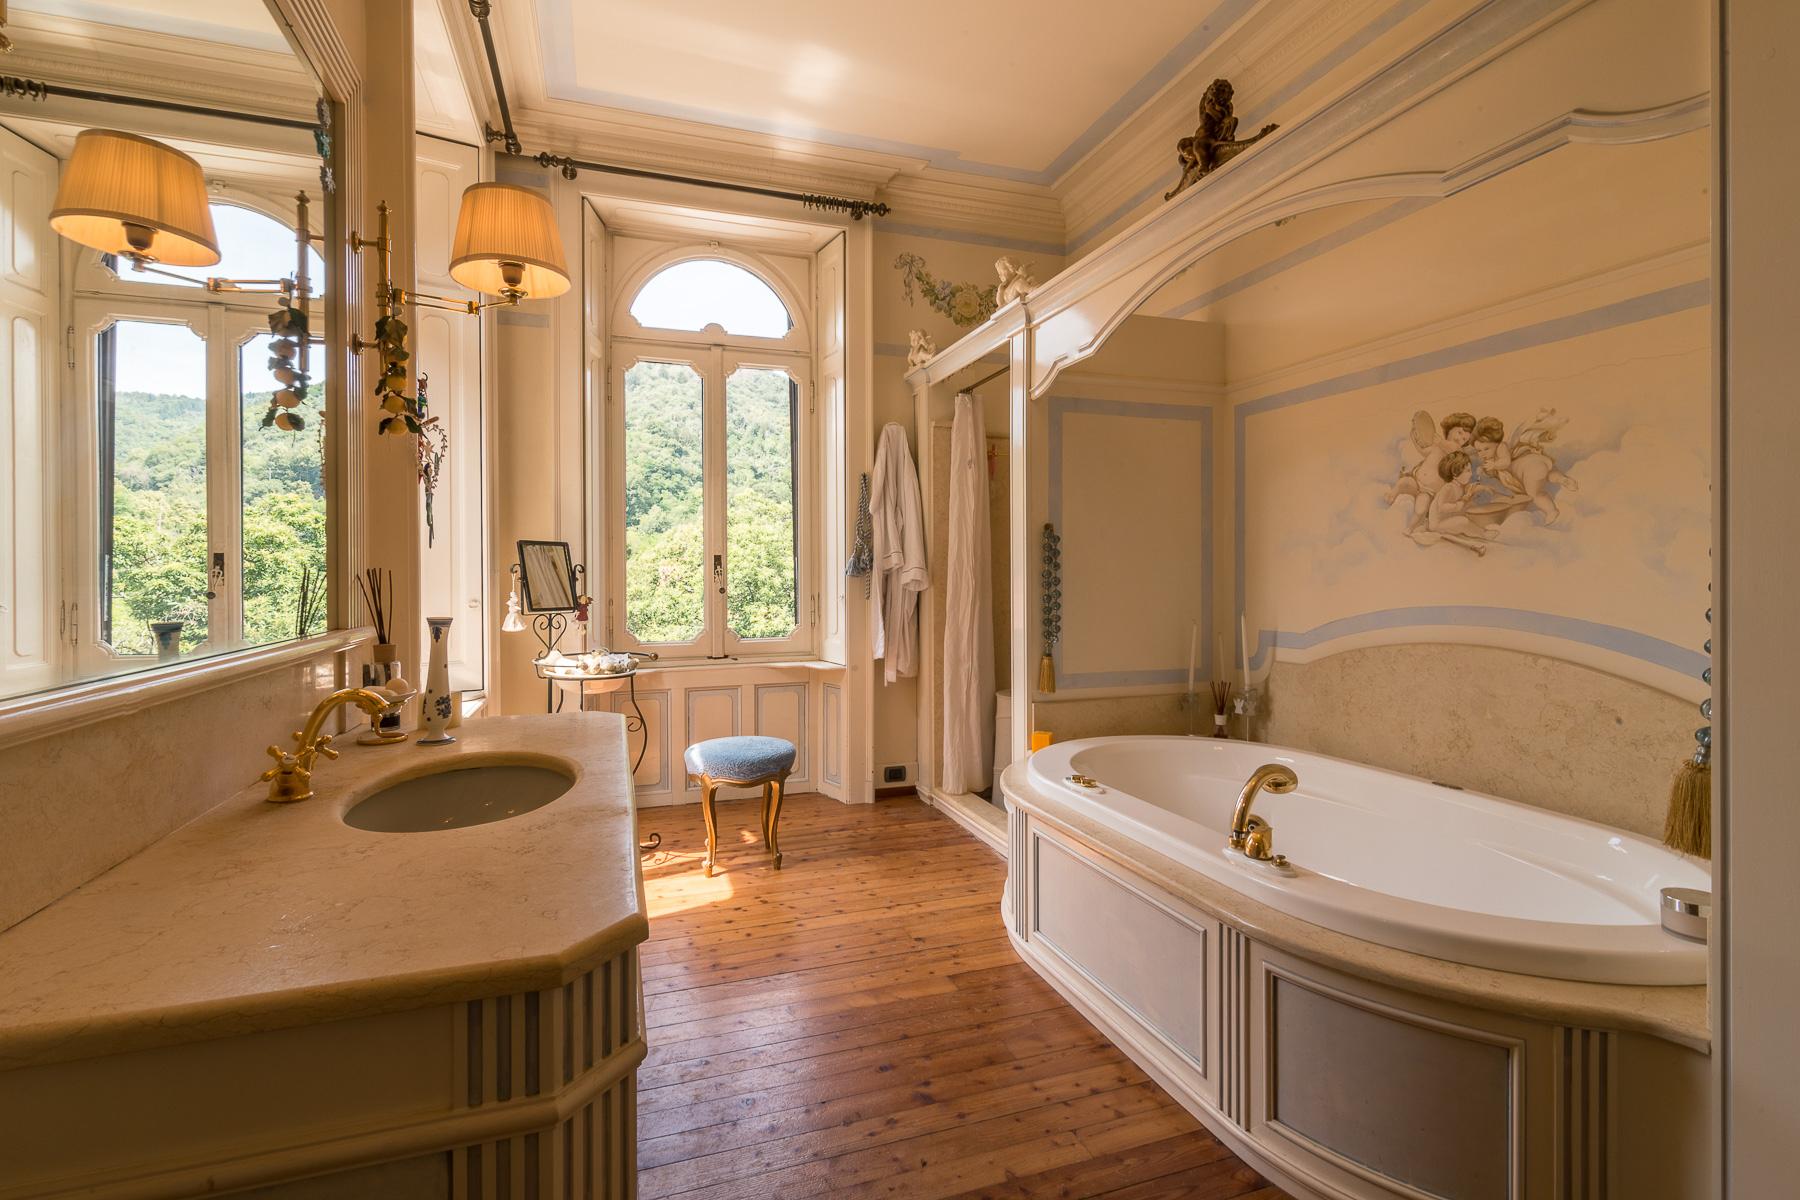 Villa in Vendita a Varese: 5 locali, 1150 mq - Foto 15